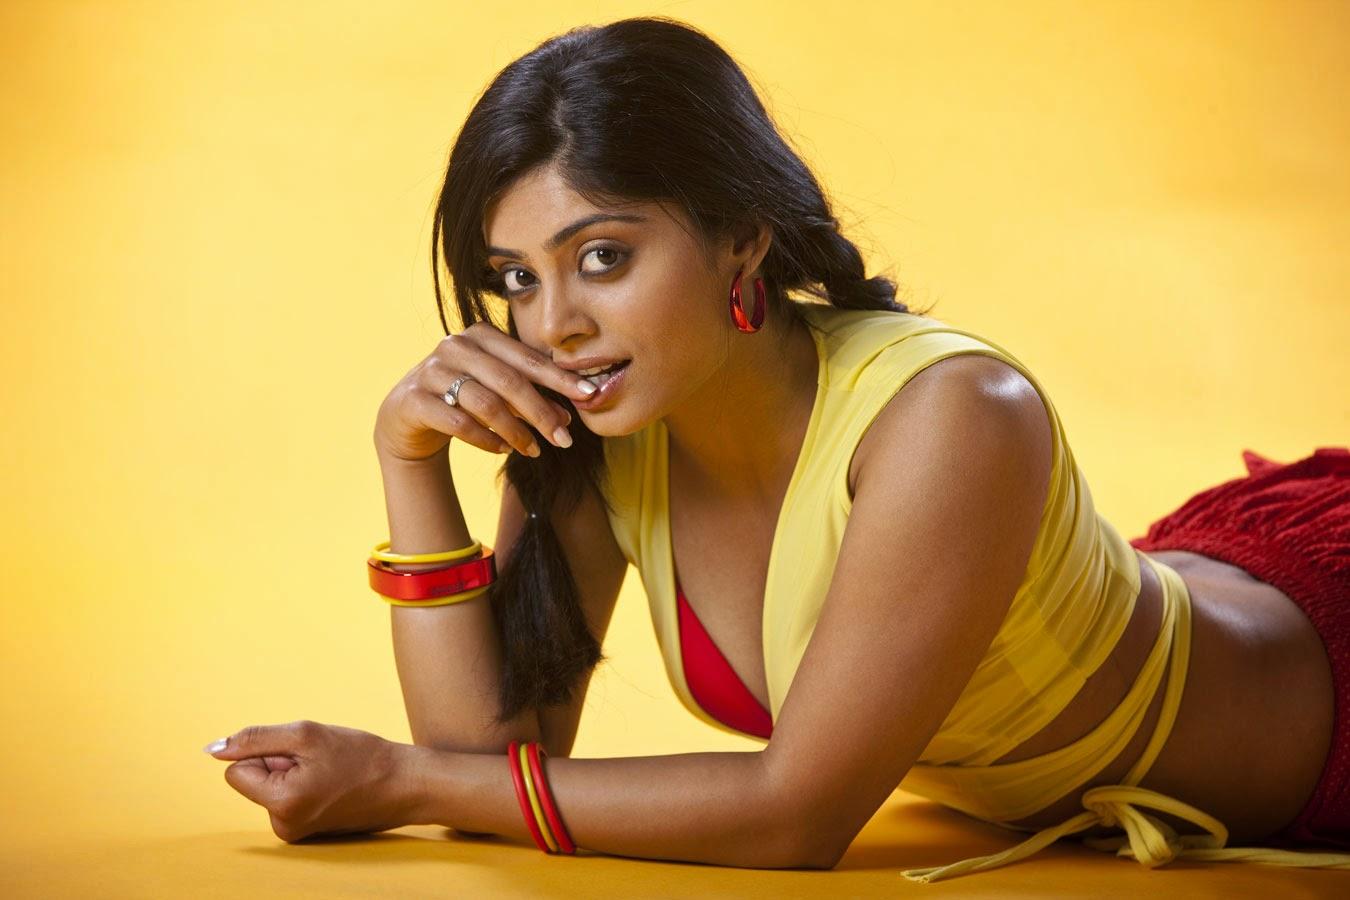 Bhavana sexy photos, eden sher xxx